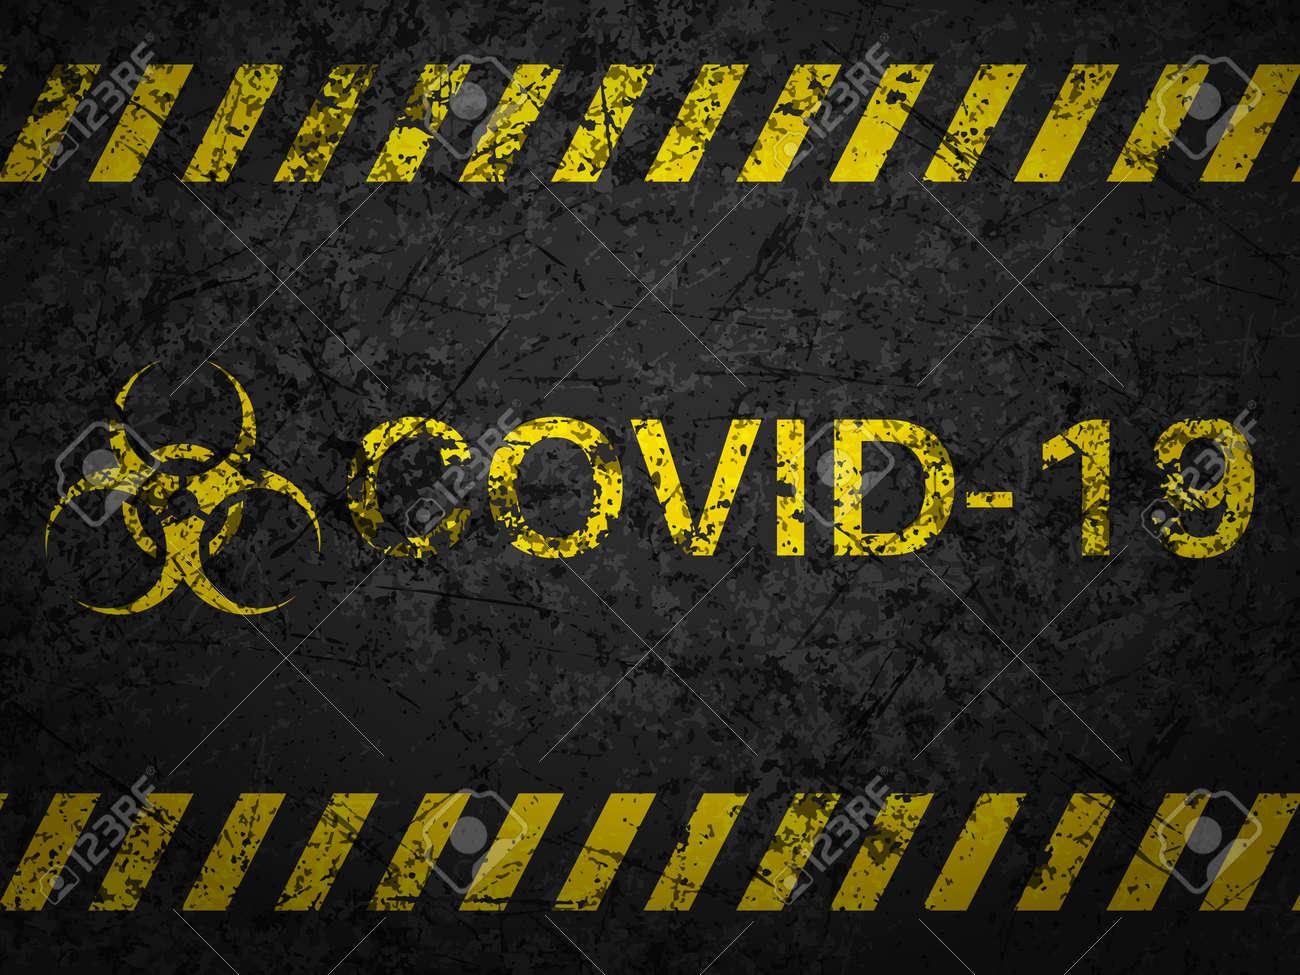 Grunge covid-19 textured background. Vector illustration. - 151862696